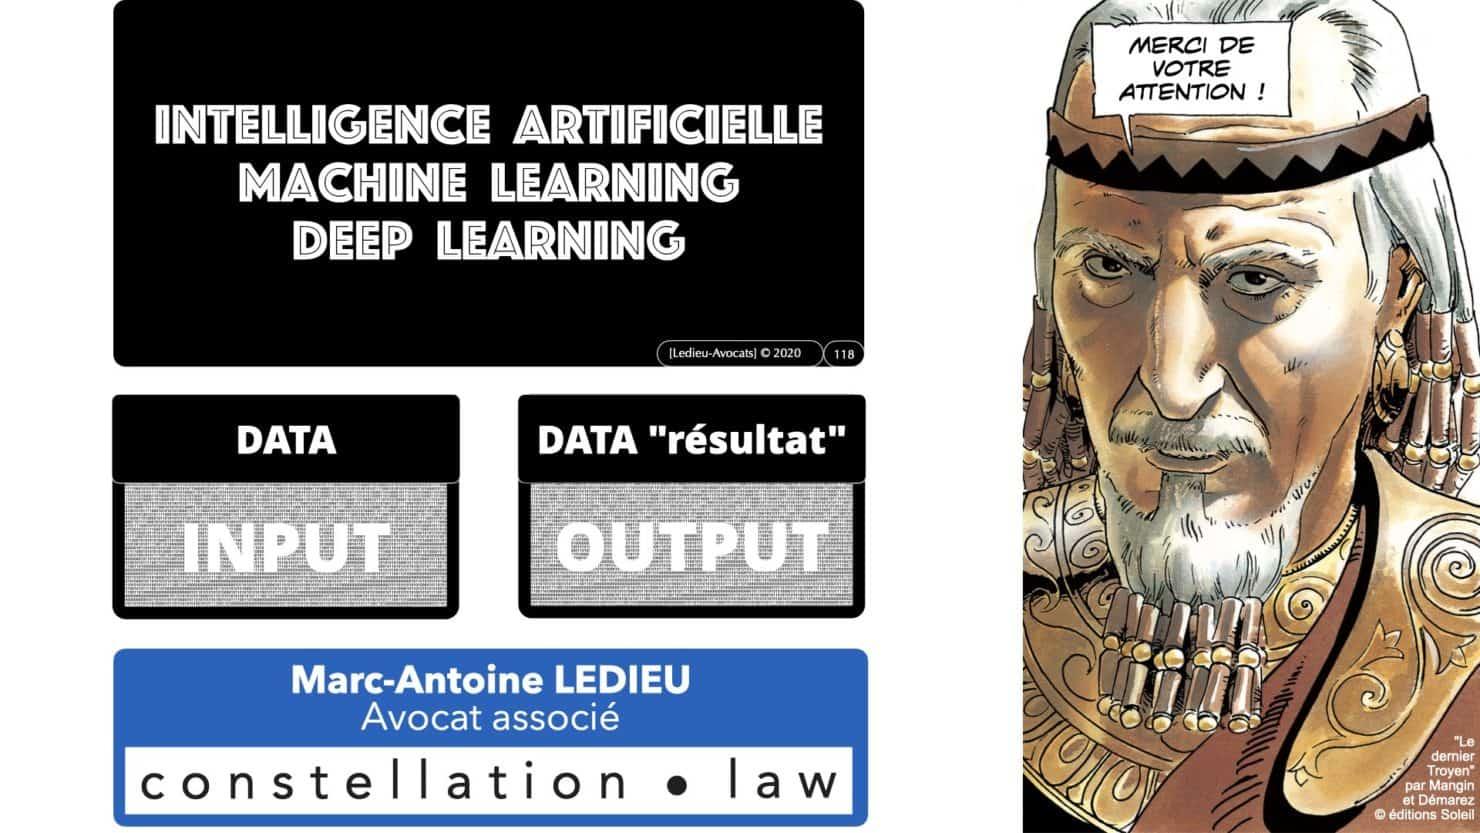 307 Intelligence artificielle-machine-learning-deep-learning-base de données-BIG-DATA *16:9* Constellation ©Ledieu-Avocat-13-10-2020.118